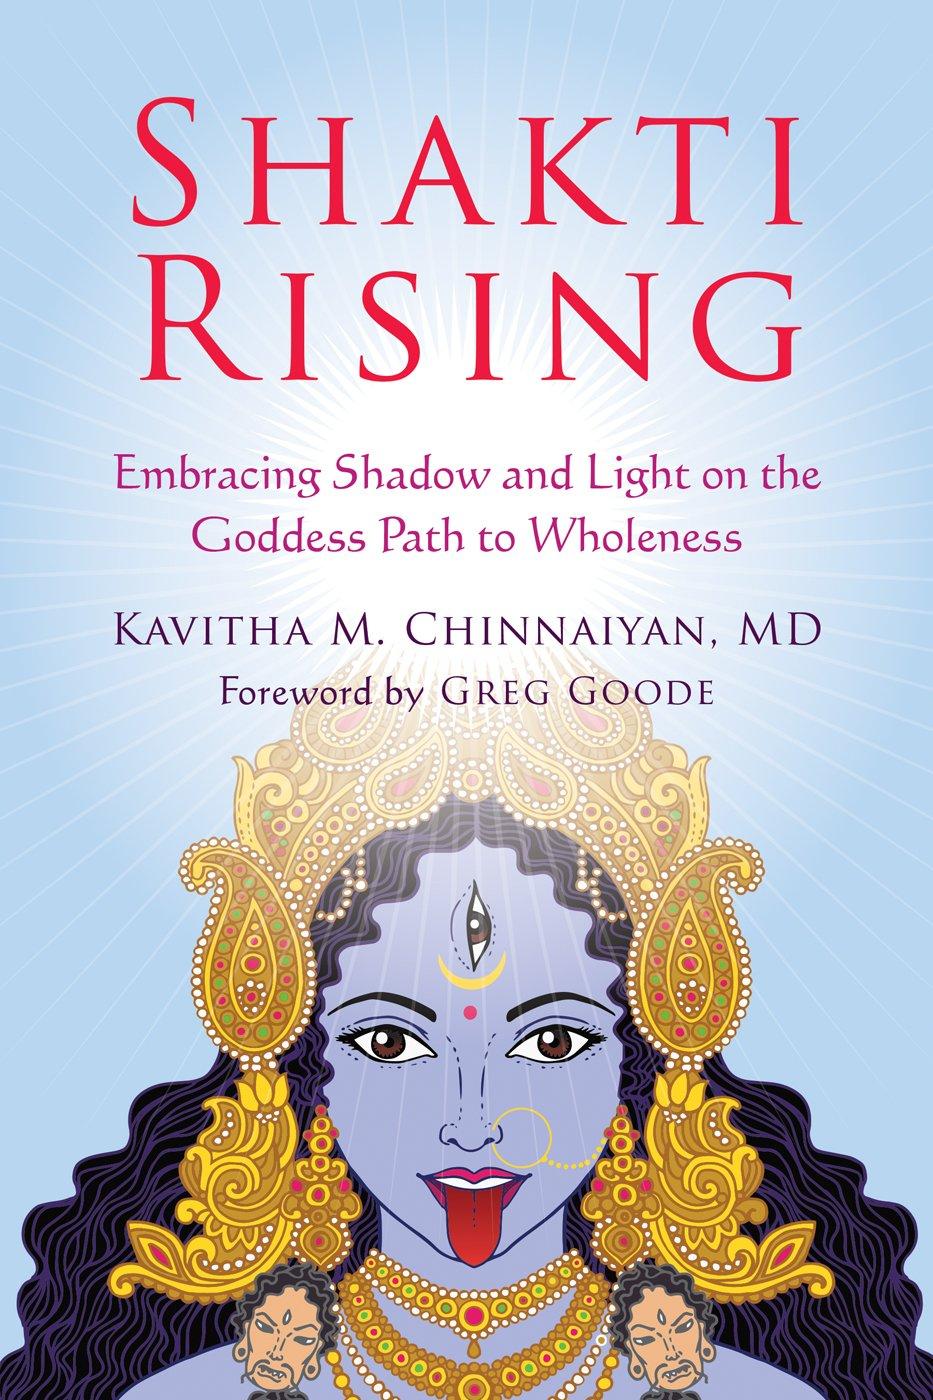 Amazon.com: Shakti Rising: Embracing Shadow and Light on the ...